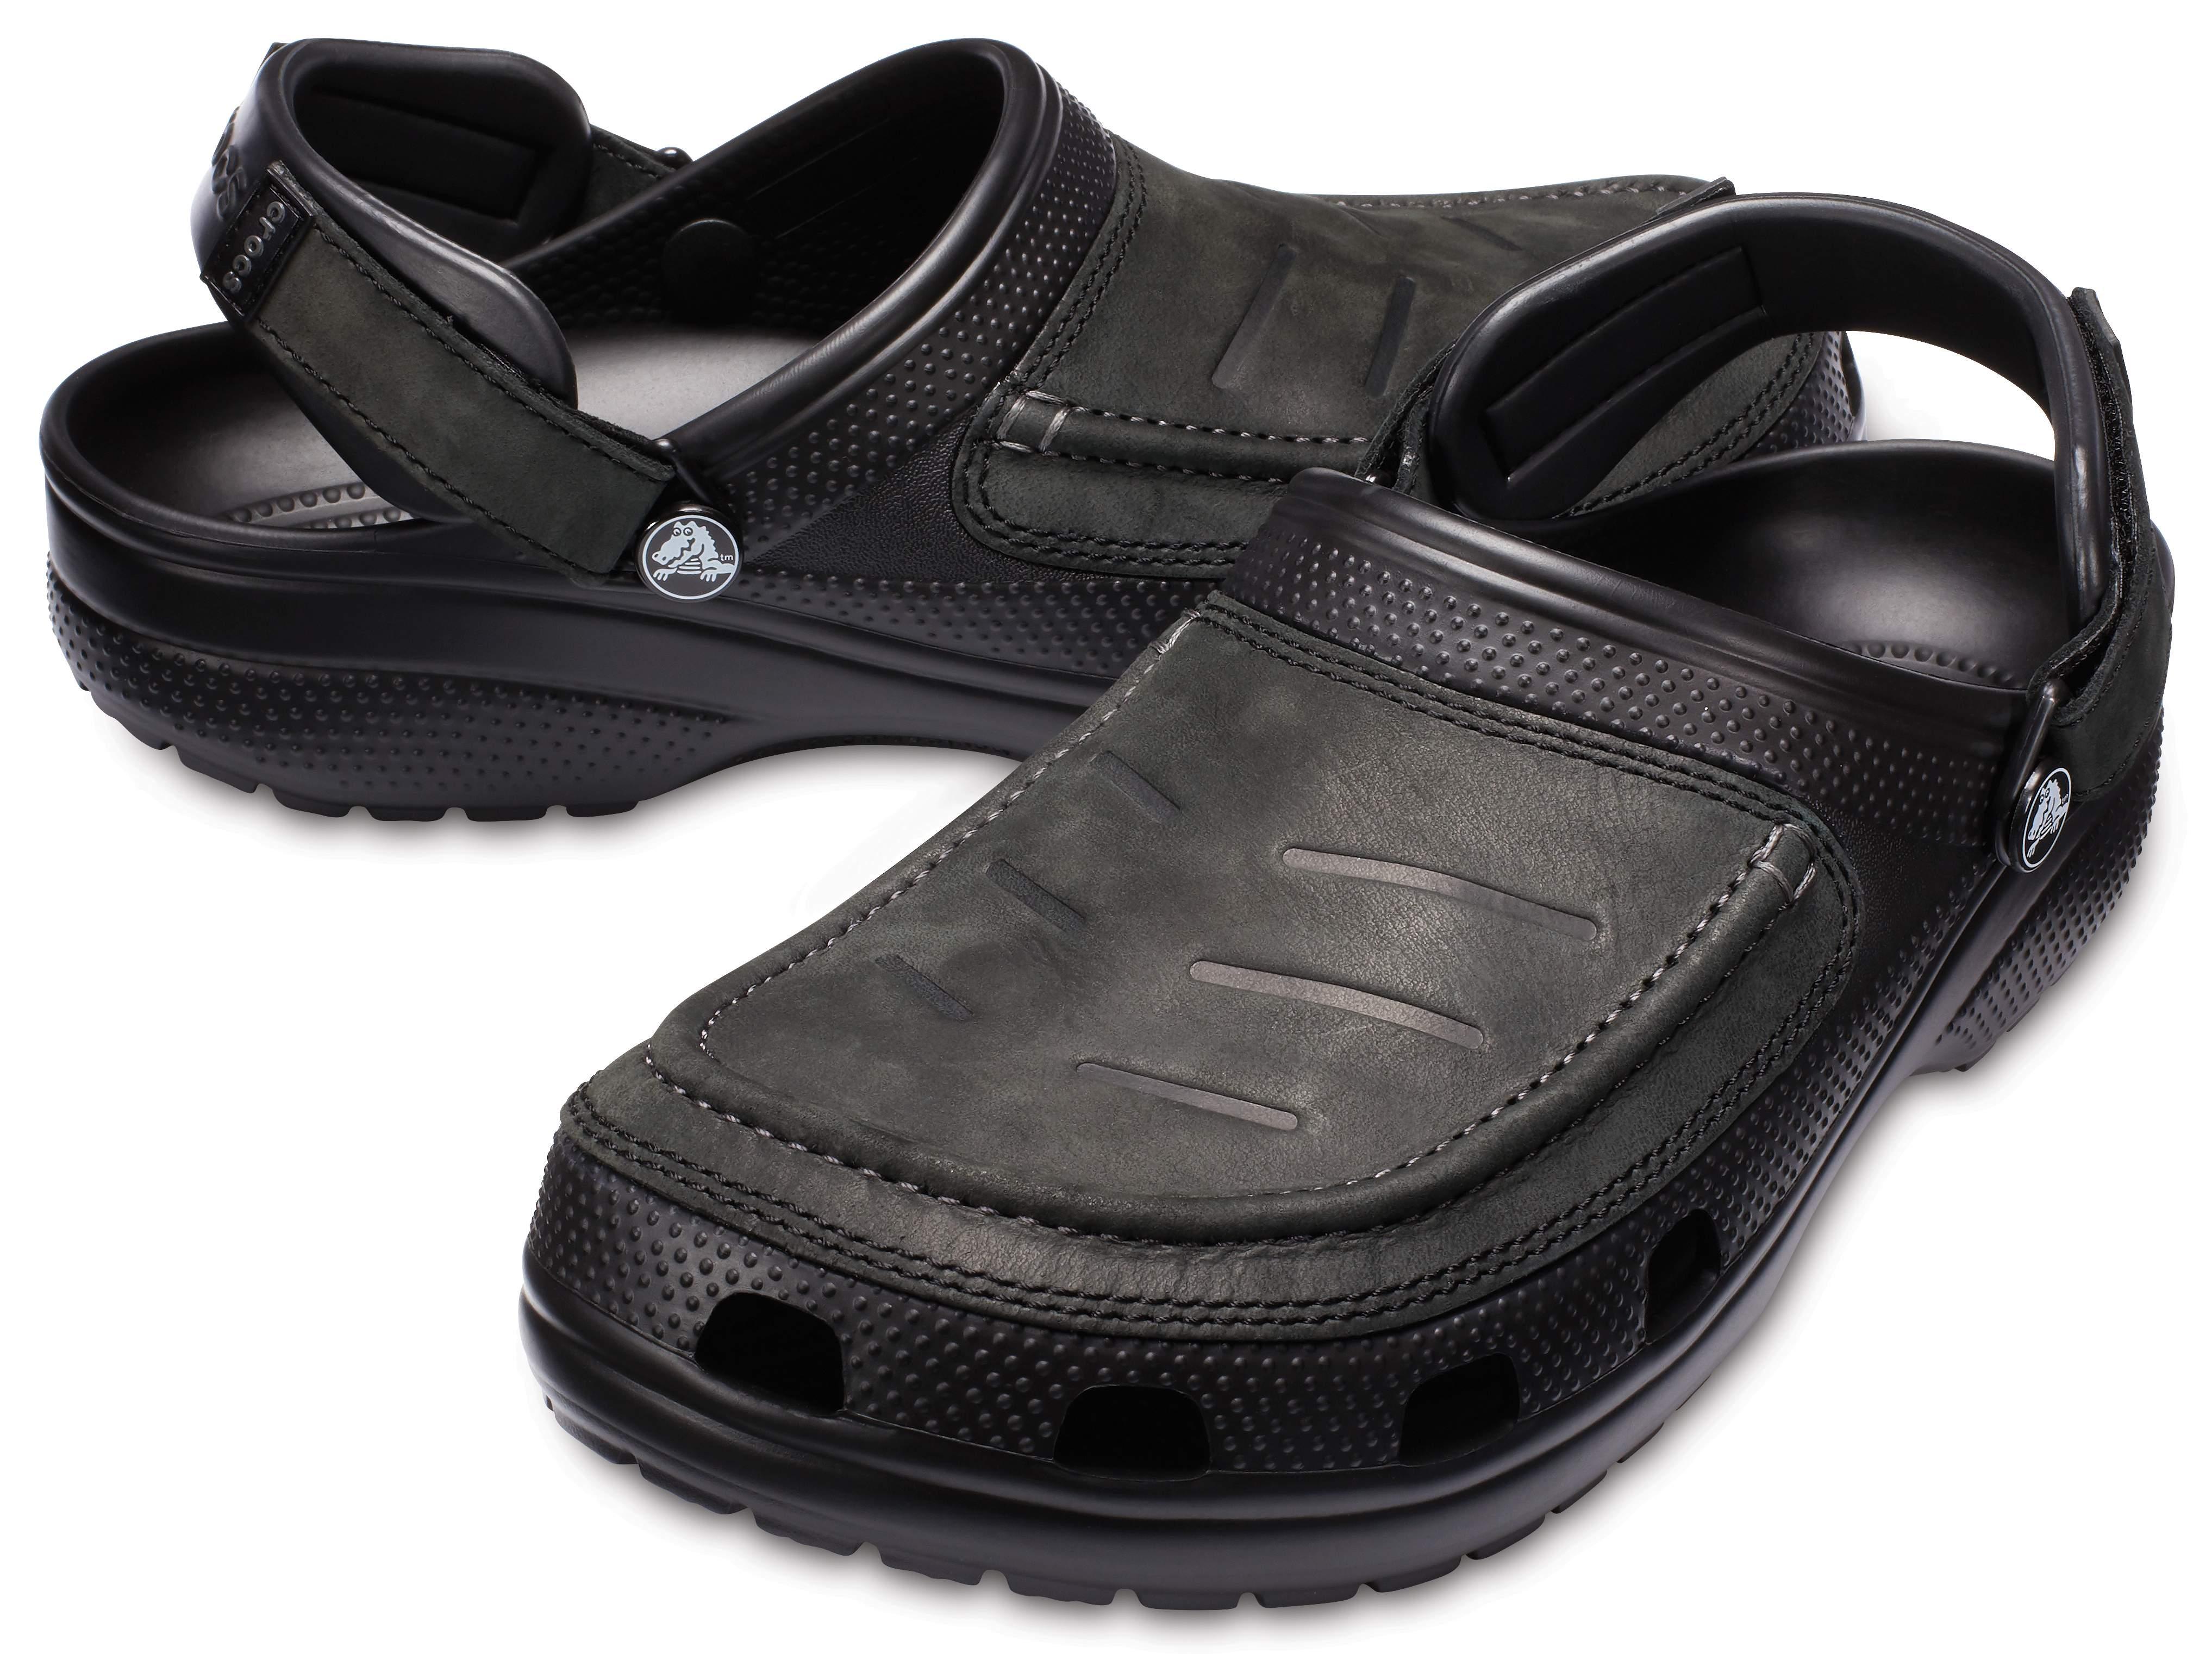 Crocs Yukon Vista Clogs Herren Leder Wandern Einstellbar Comfort Sandalen Schuhe